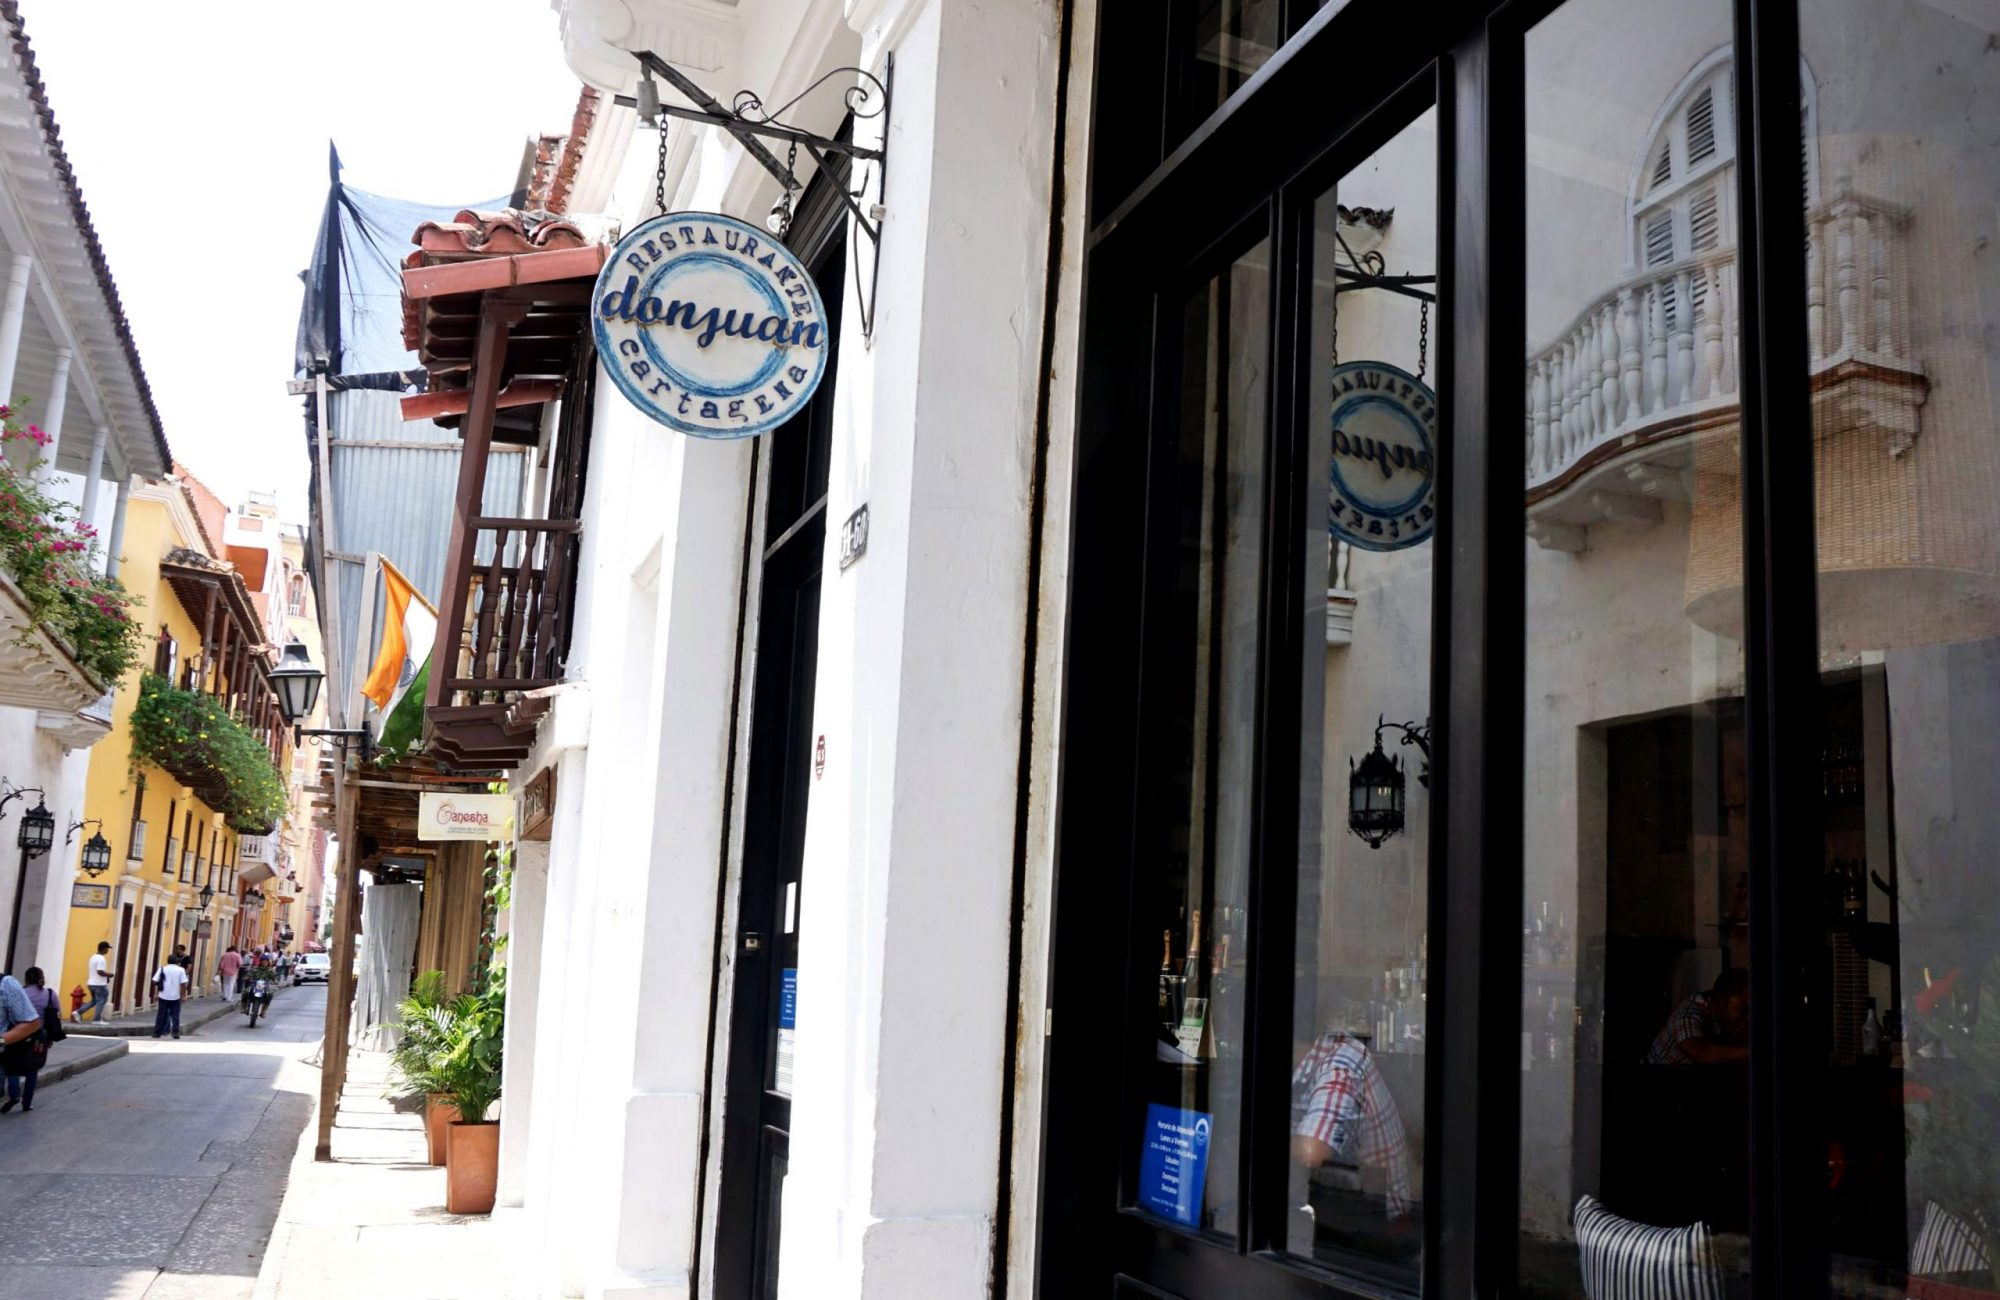 Restaurante Donjuan Cartagena